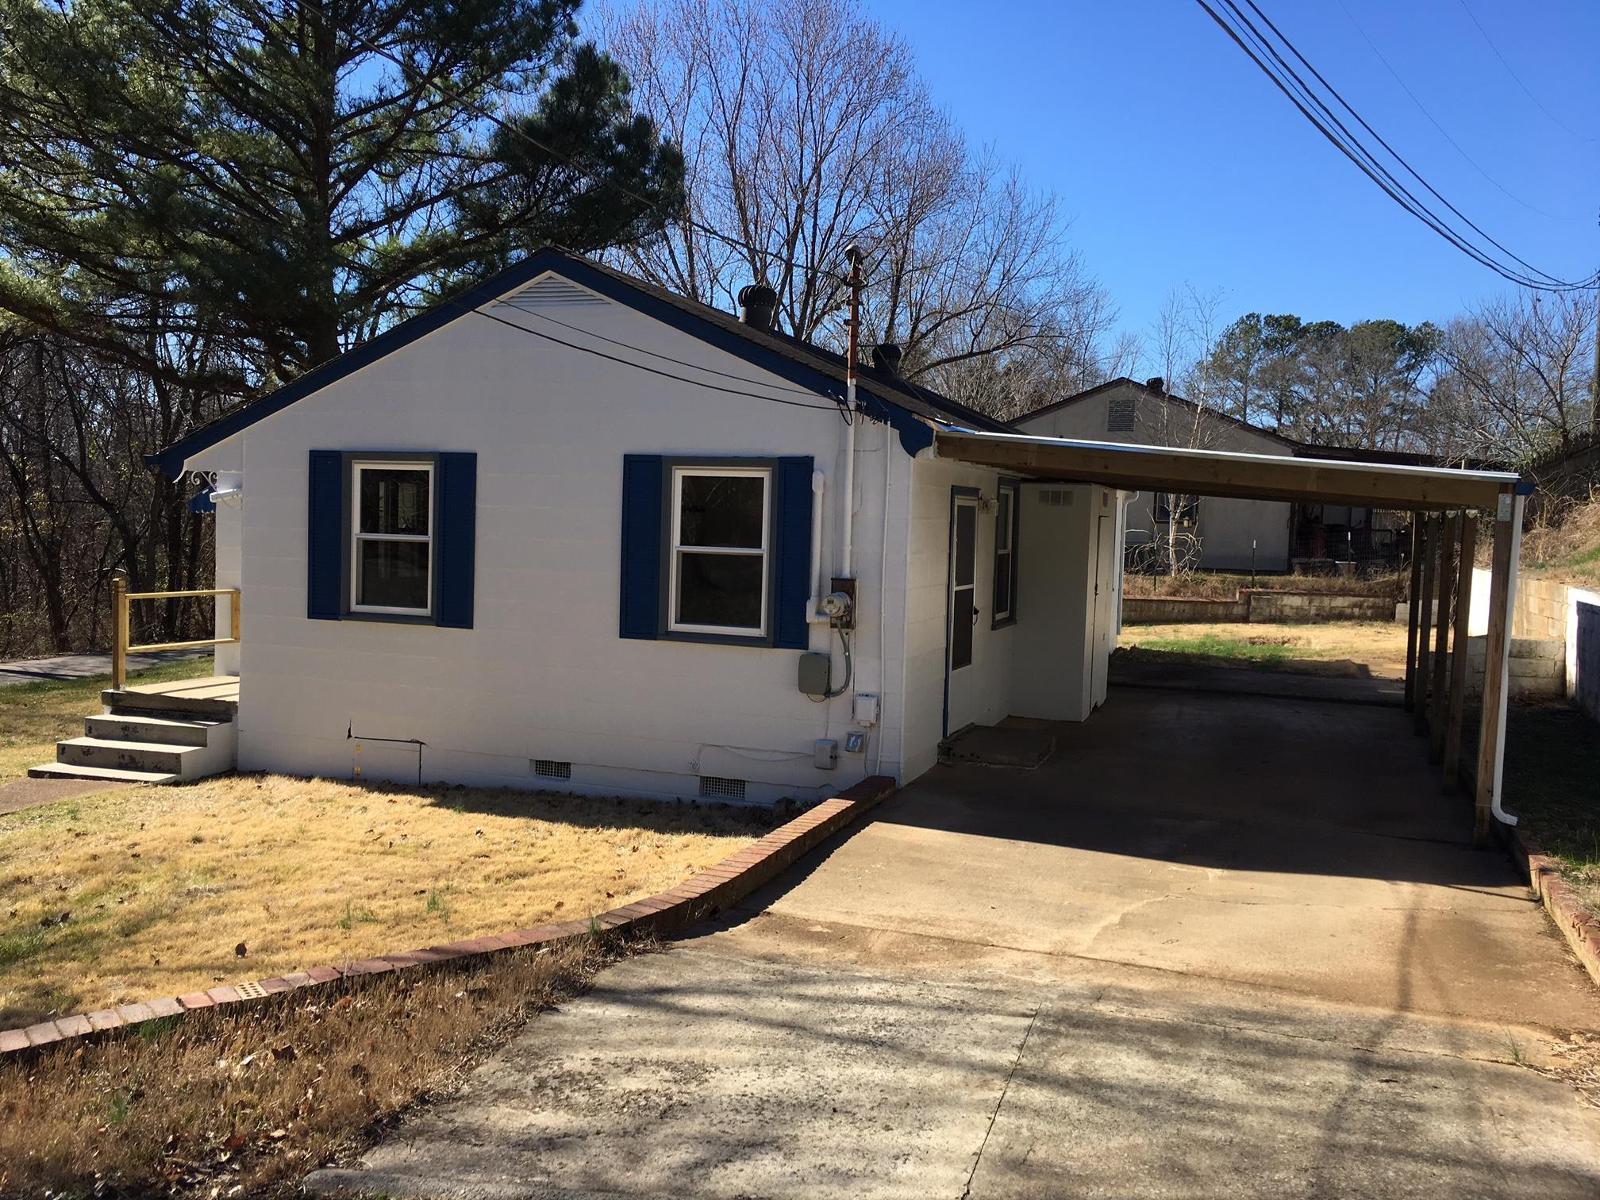 883 elwood dr clarksville tn mls 1802111 era for Home builders clarksville tn